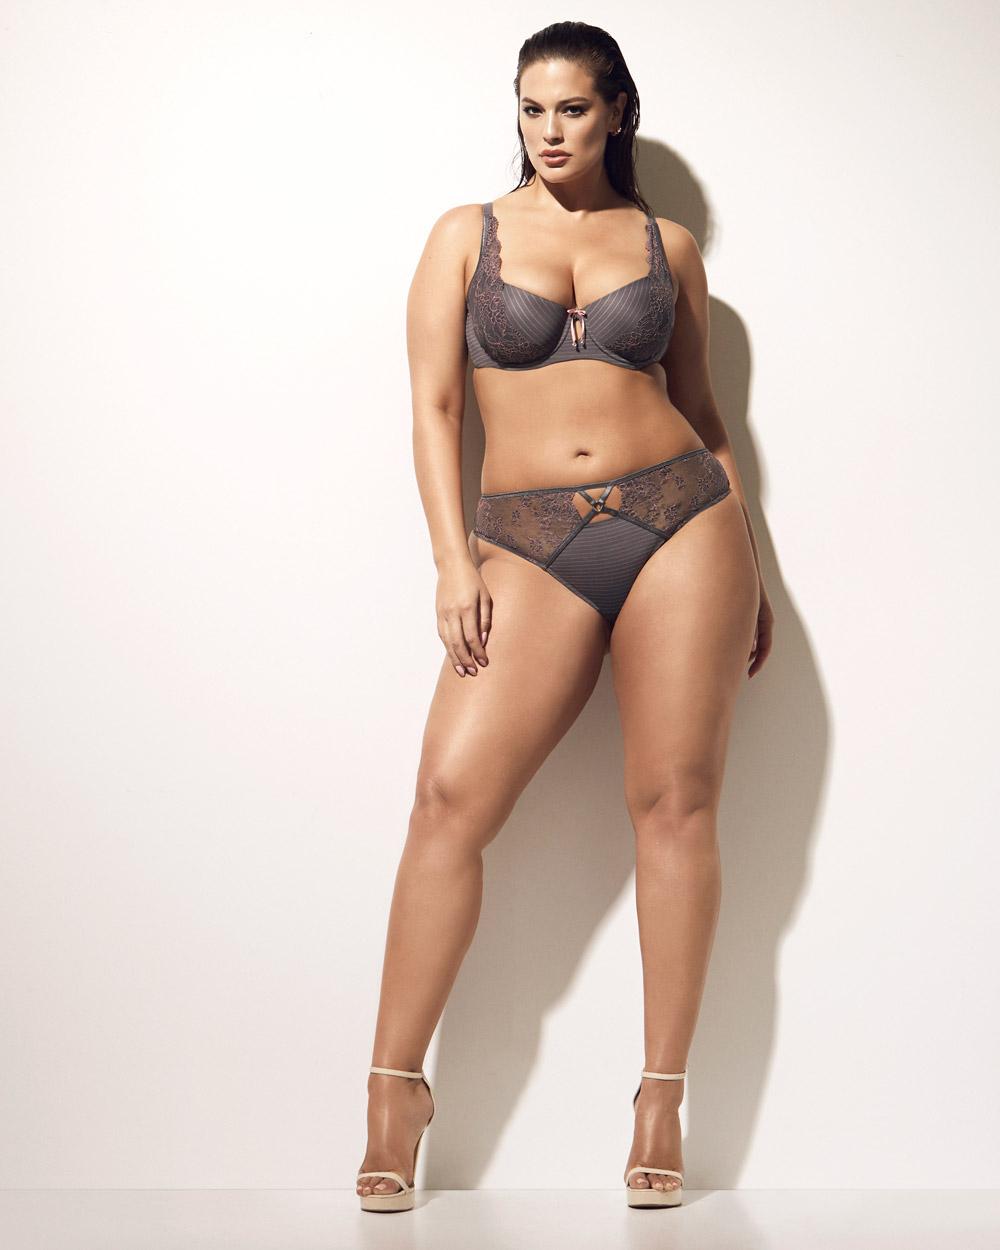 Ashley Graham Diva bra with matching panty